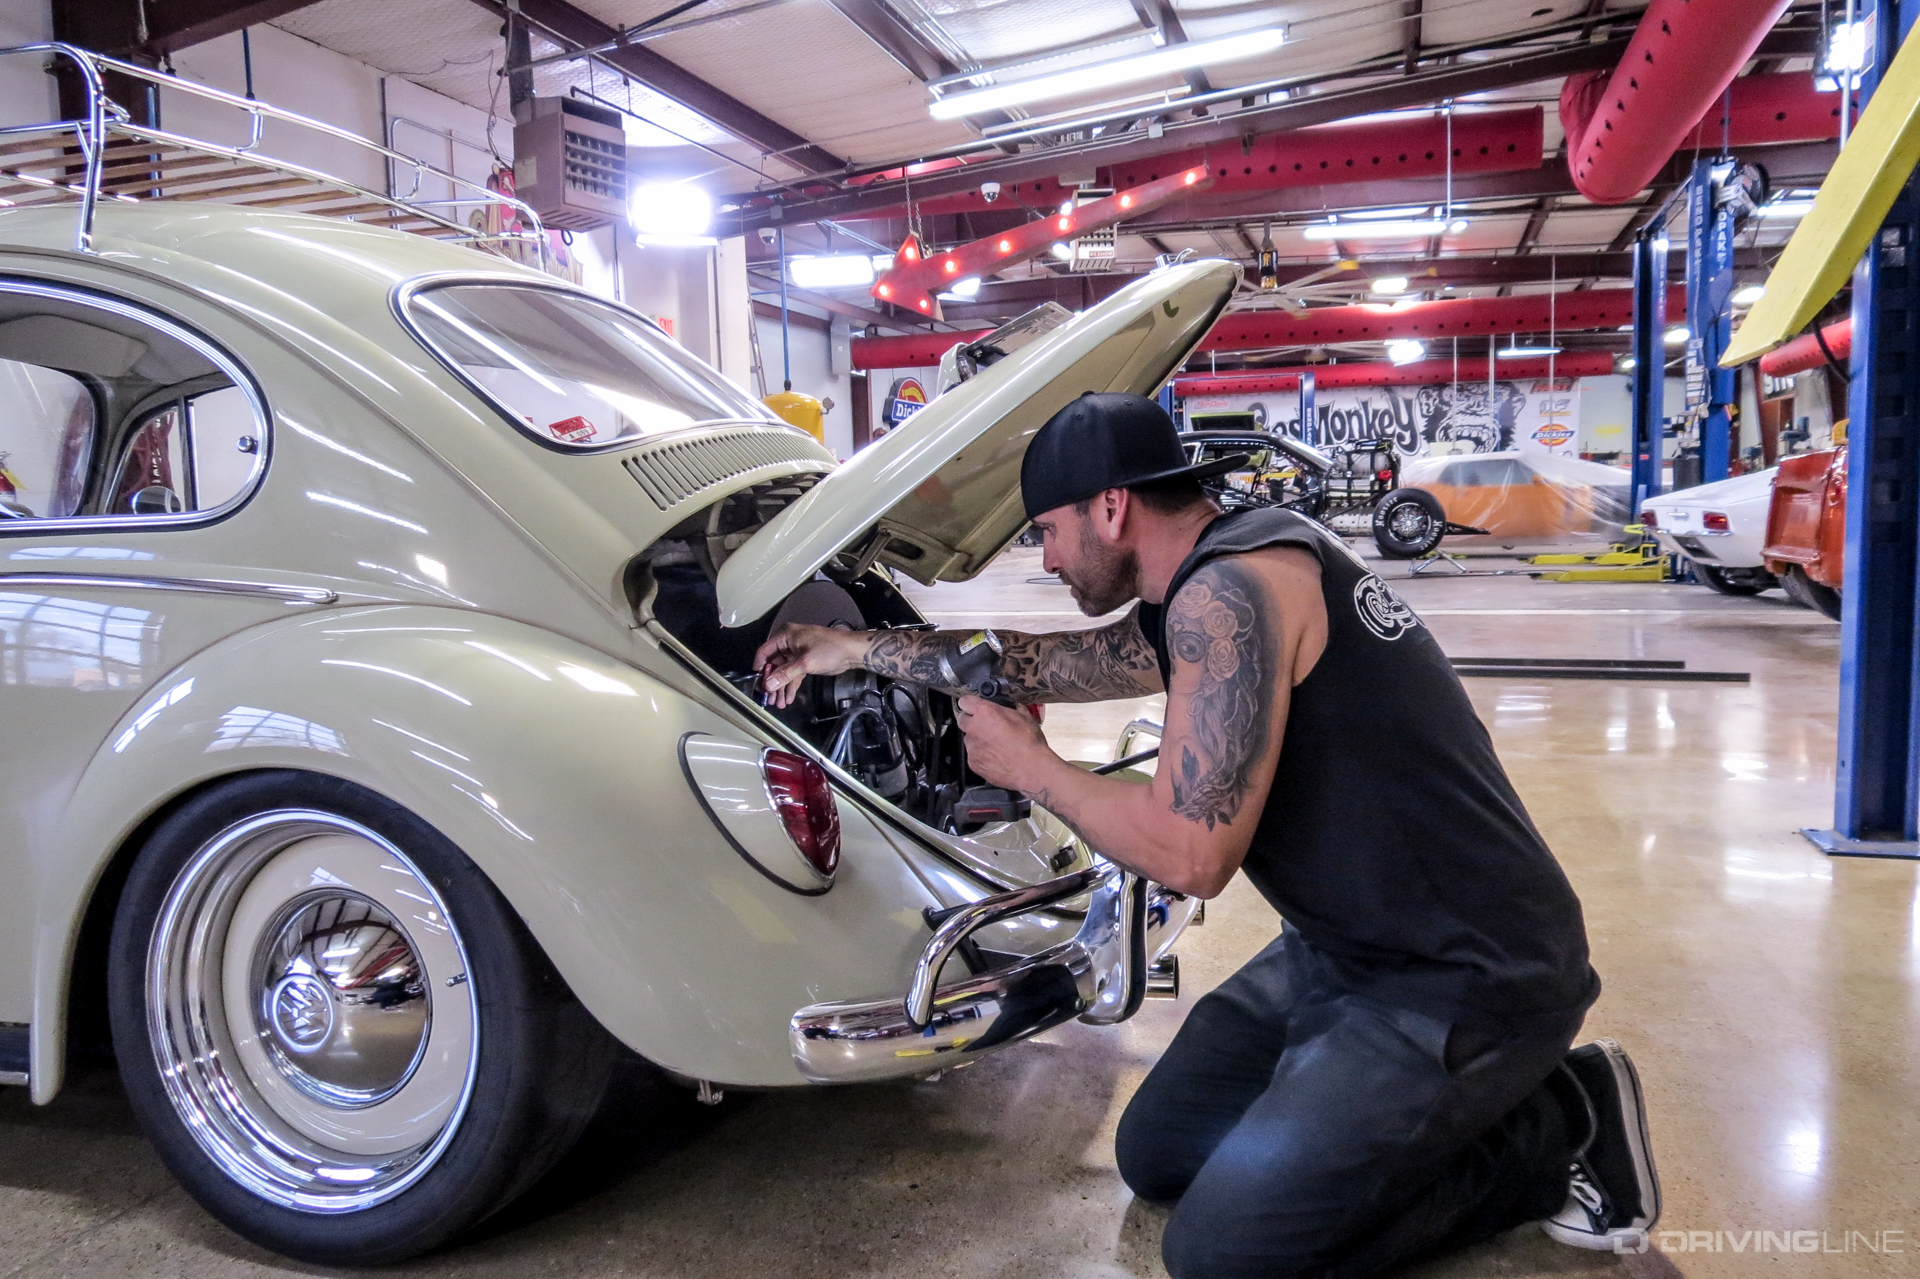 Gas Monkey Garage : Gas monkey garage uses large portable fans ceiling fans by big